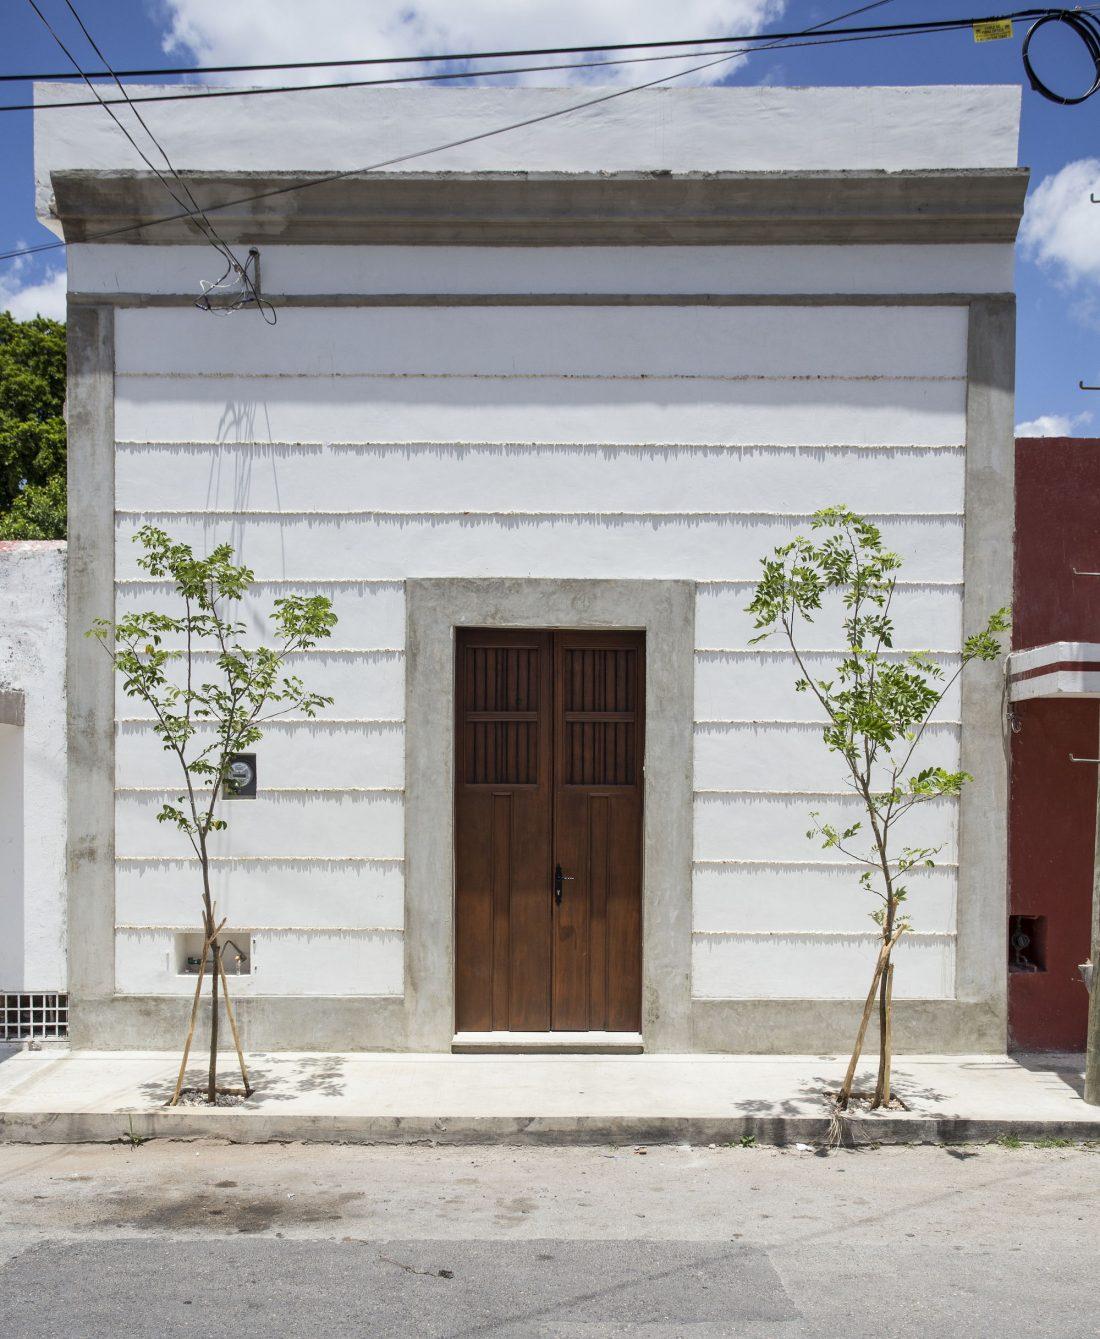 limonnyj-dom-v-meksike-fotografii-interera-3